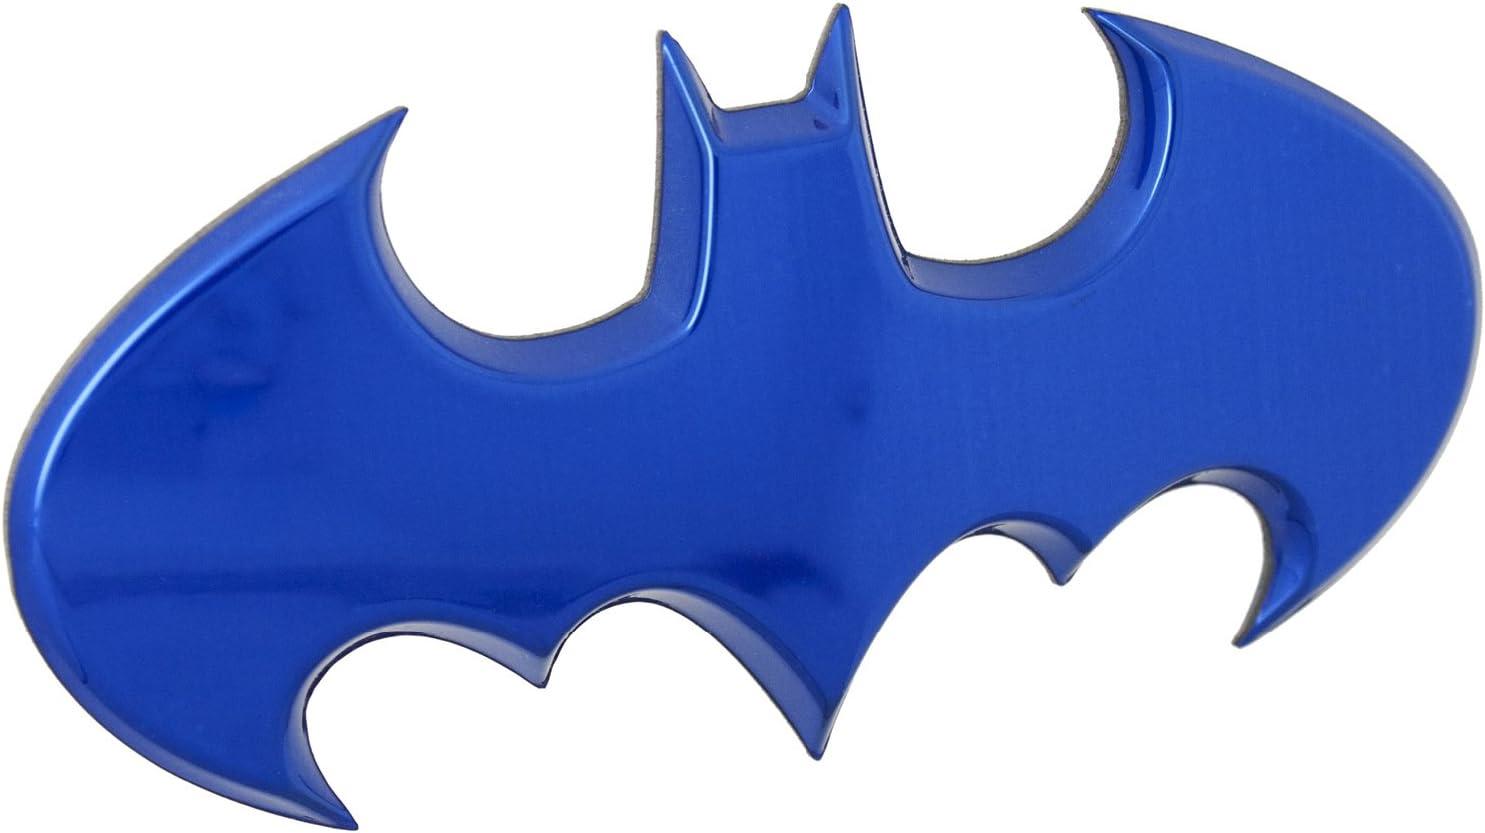 Fan Emblems Batman 3D Car Badge - 1989 Batwing Logo (Blue Chrome)